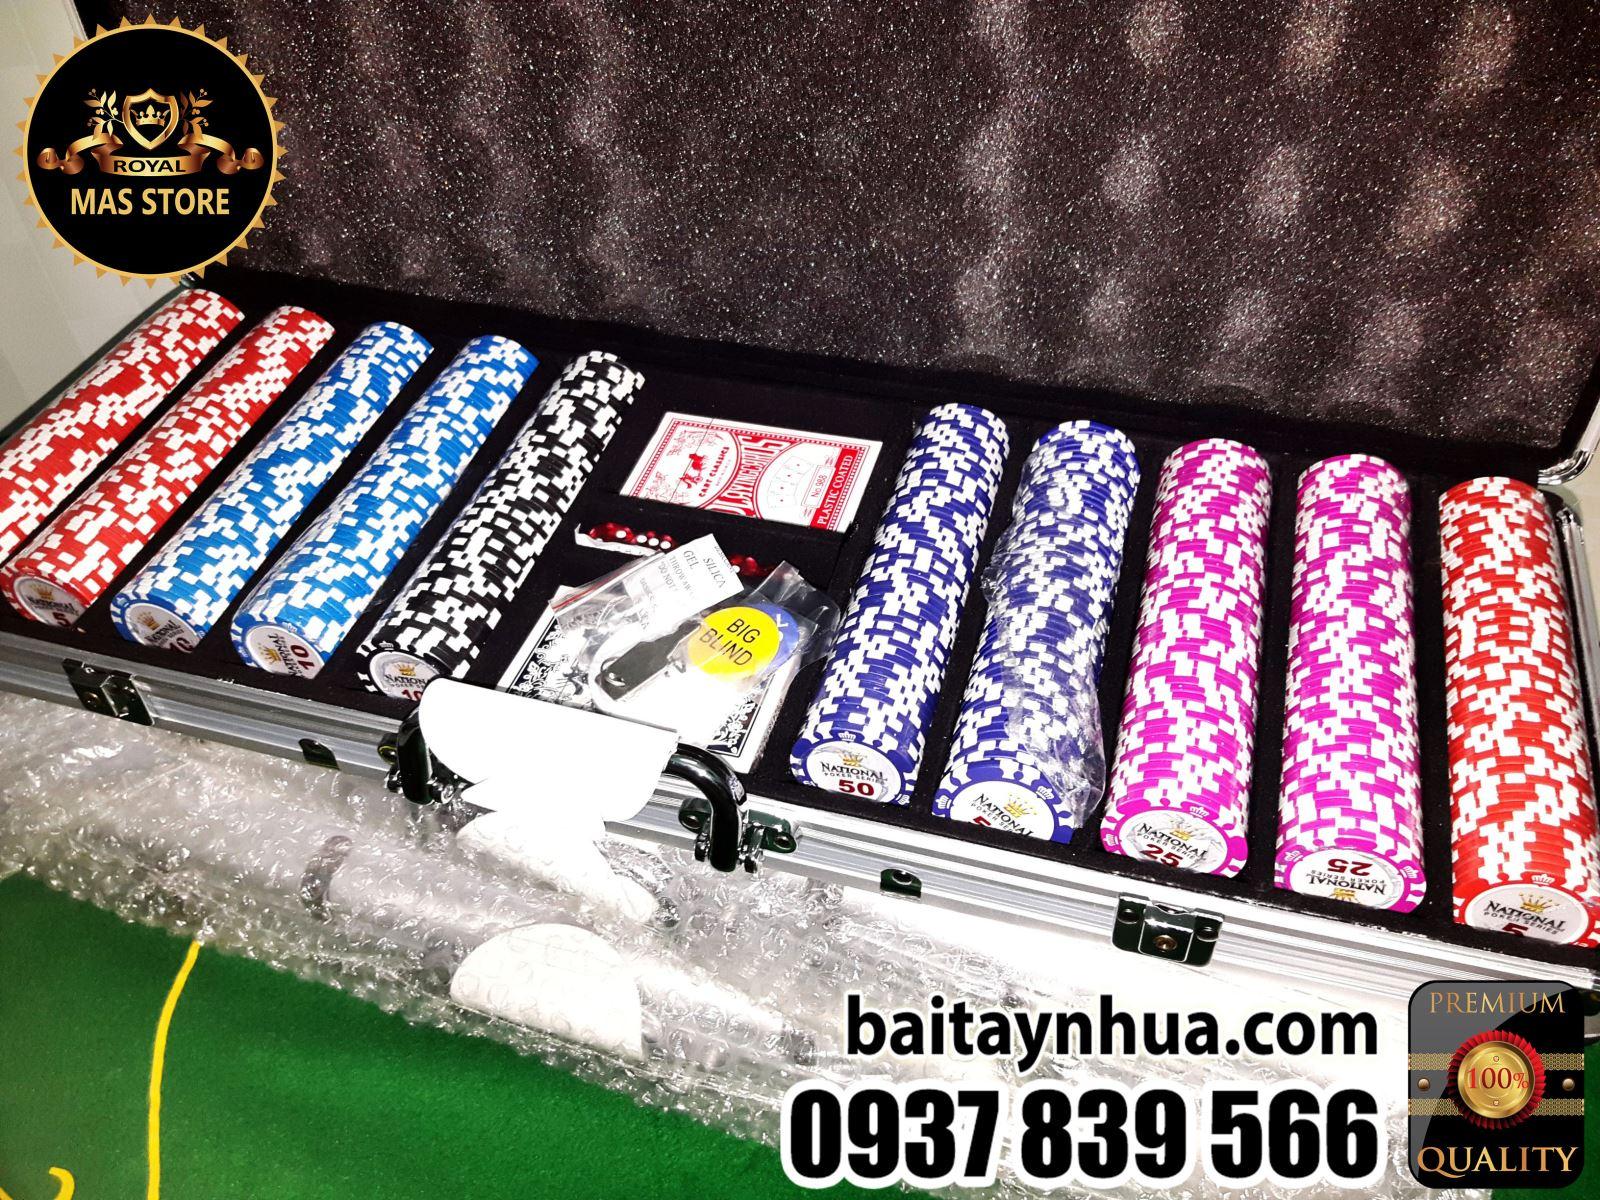 500 Phỉnh Poker National Cao Cấp Có Số